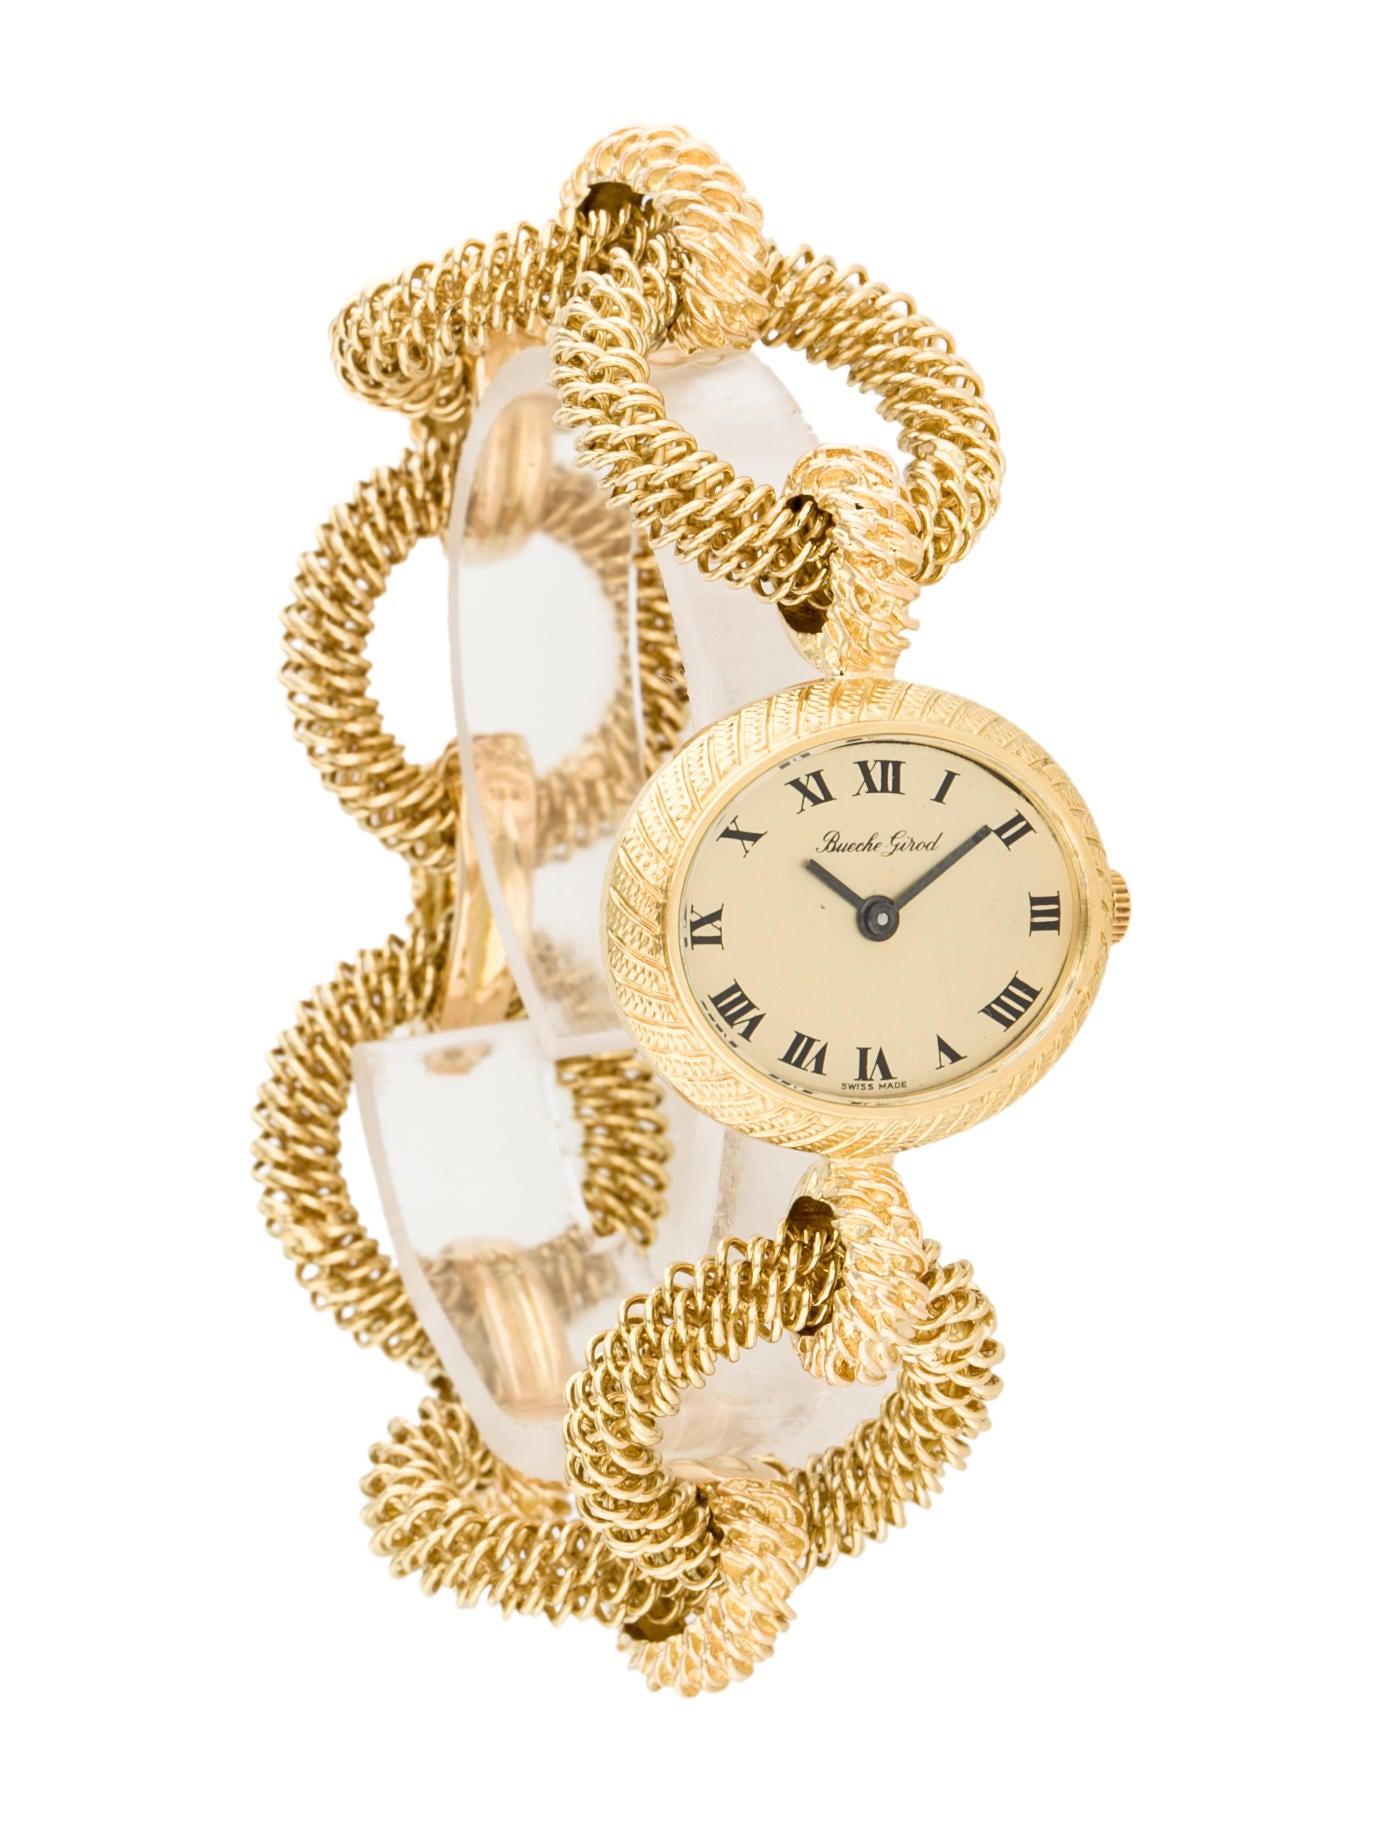 bueche girod 18k 1960 vintage watch bracelet buy20001 the 18k 1960 vintage watch